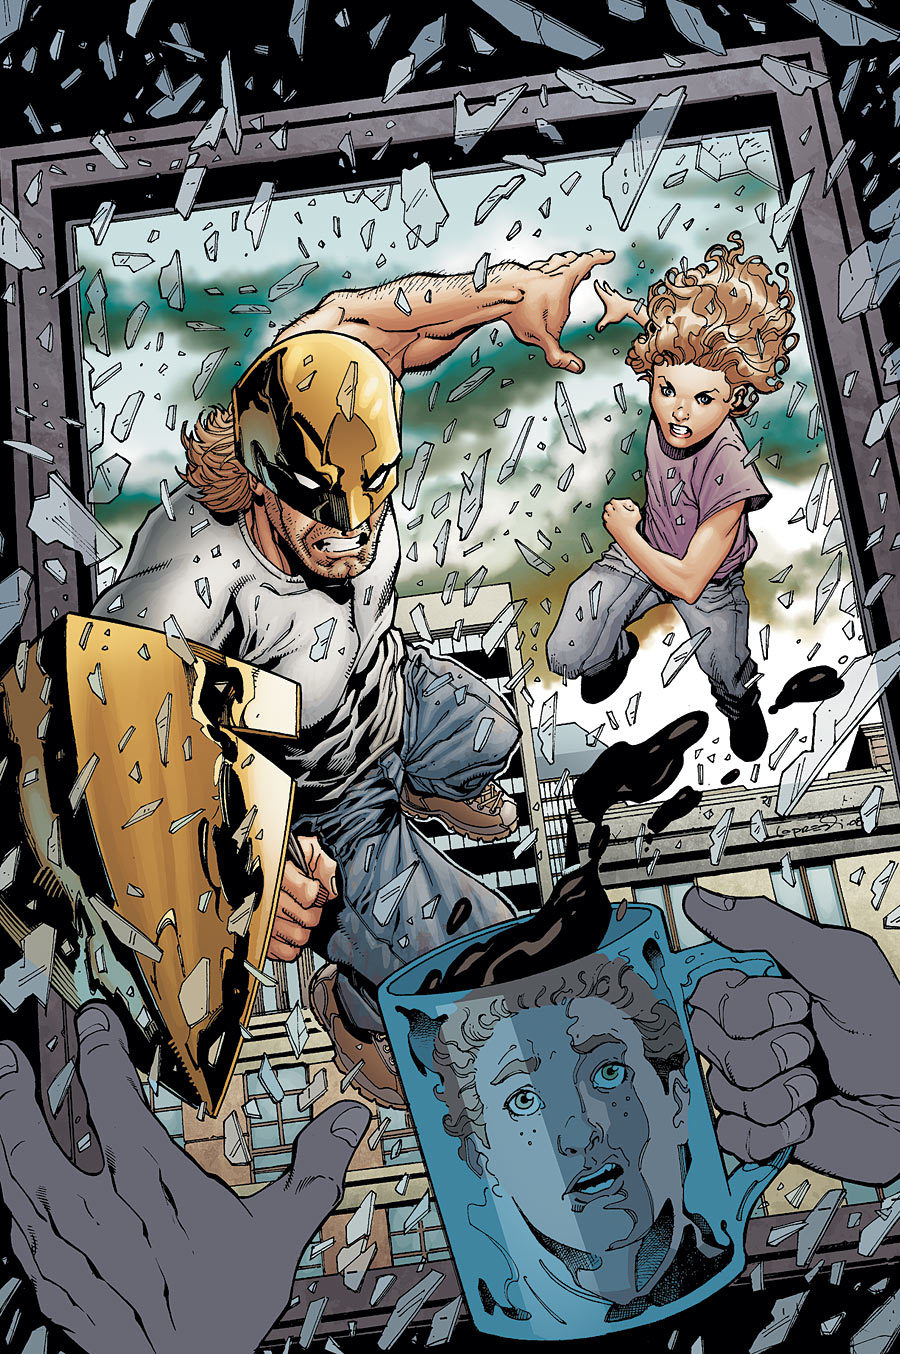 Adventure Comics Special Featuring Guardian Vol 1 1 Textless.jpg